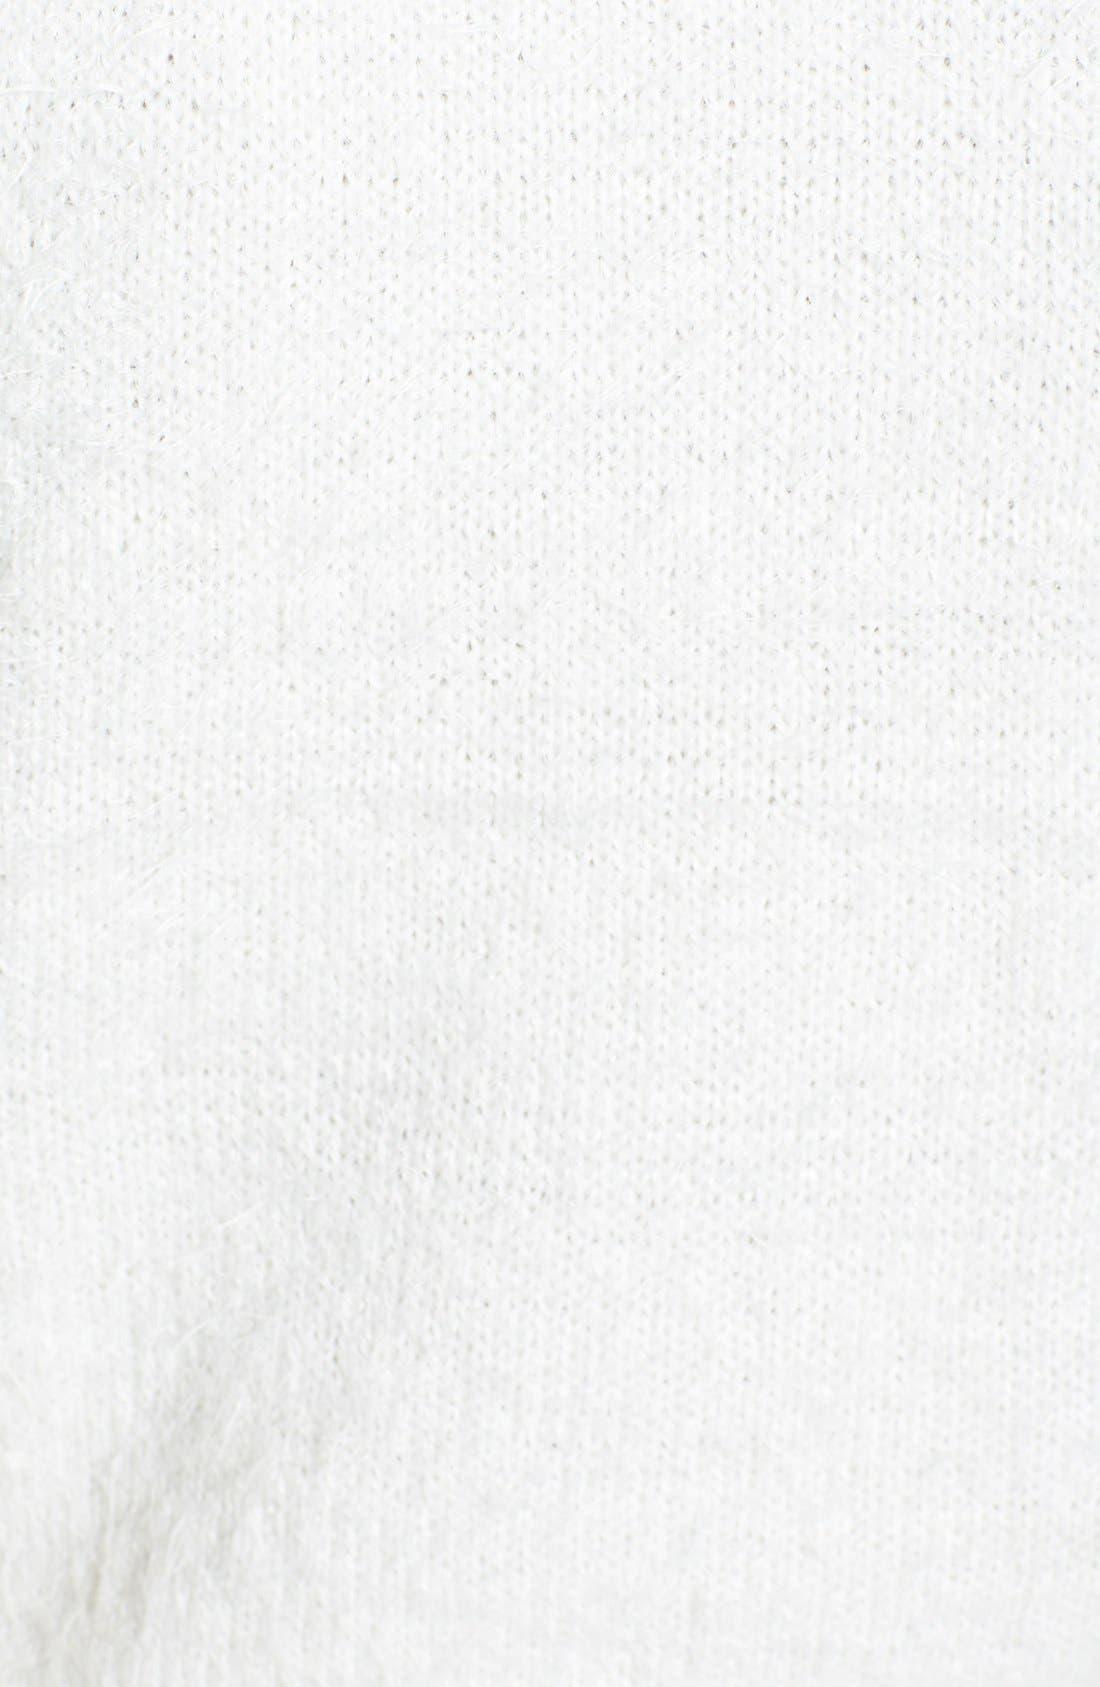 Alternate Image 3  - MINKPINK 'Goodluck Charm' Textured Knit Tank